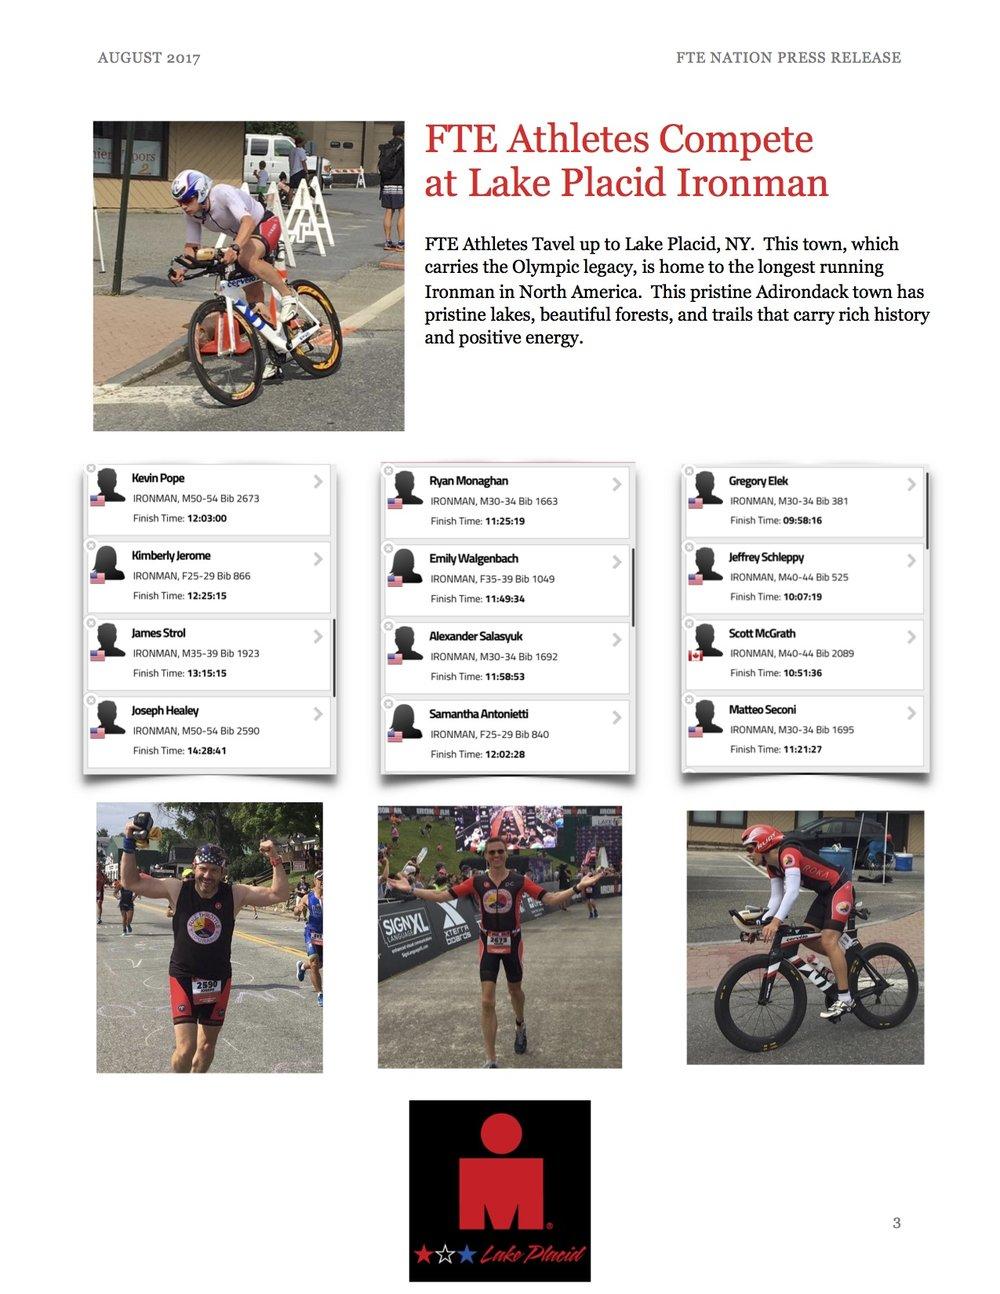 August 2017 Press Release 3.jpg